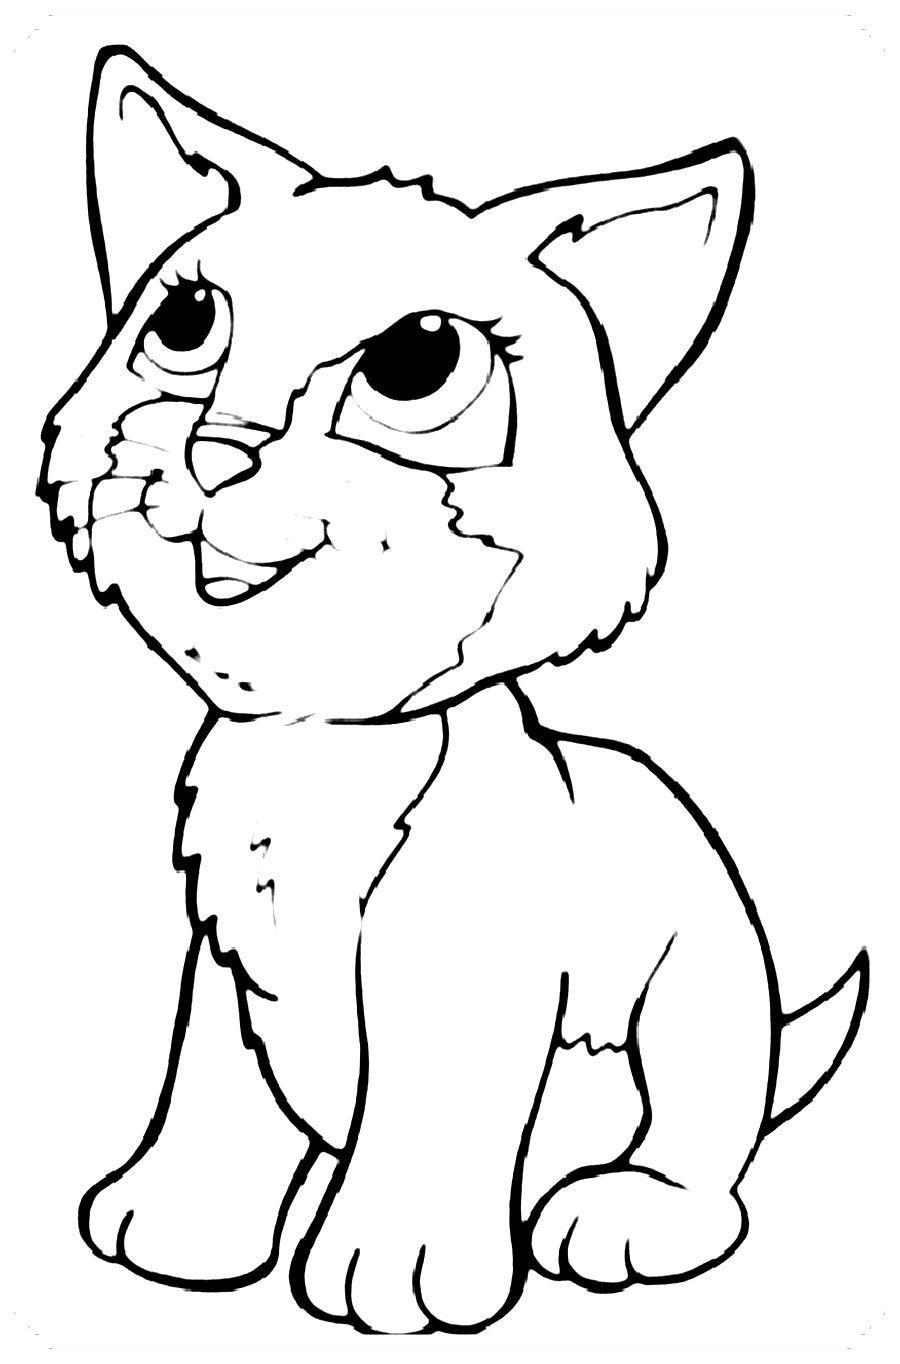 Dibujos De Gatos Para Colorear Gatito Para Colorear Dibujos